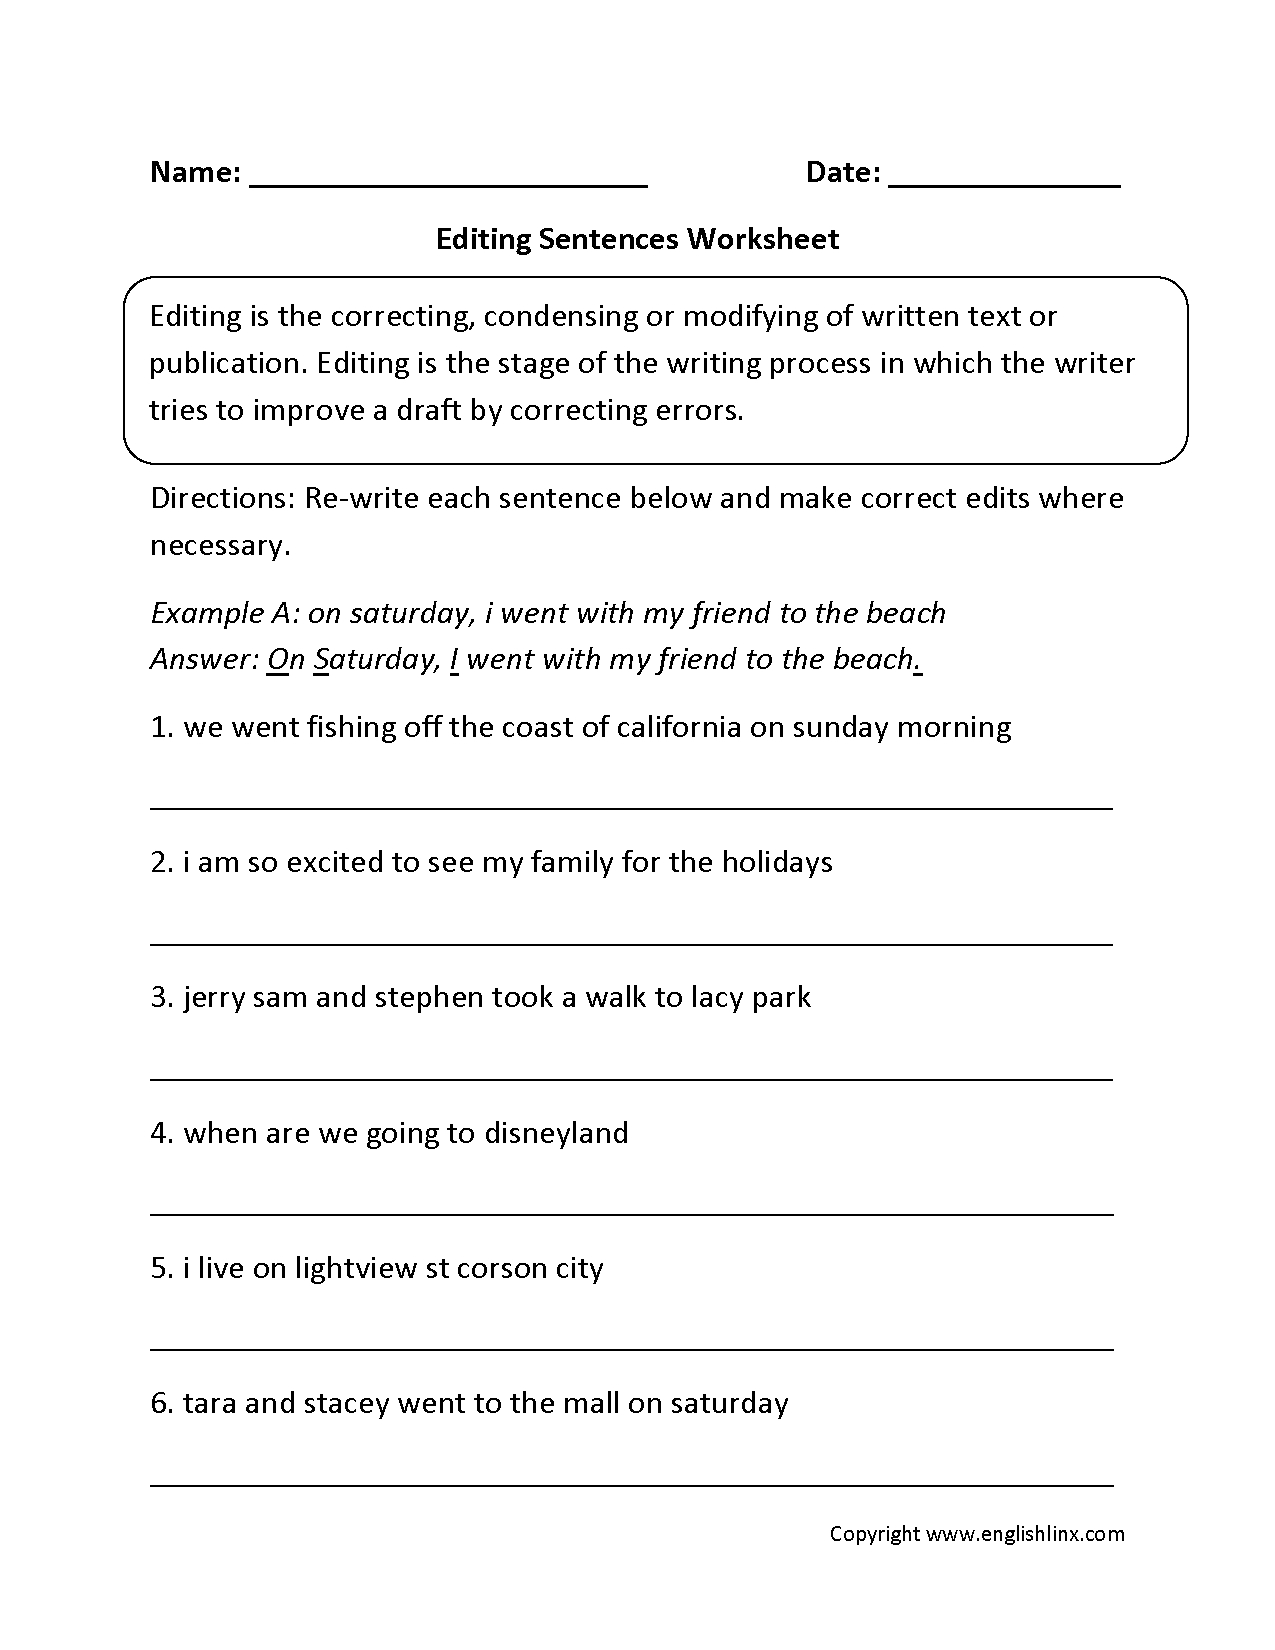 Writing Worksheets | Editing Worksheets - Free Printable Sentence Correction Worksheets